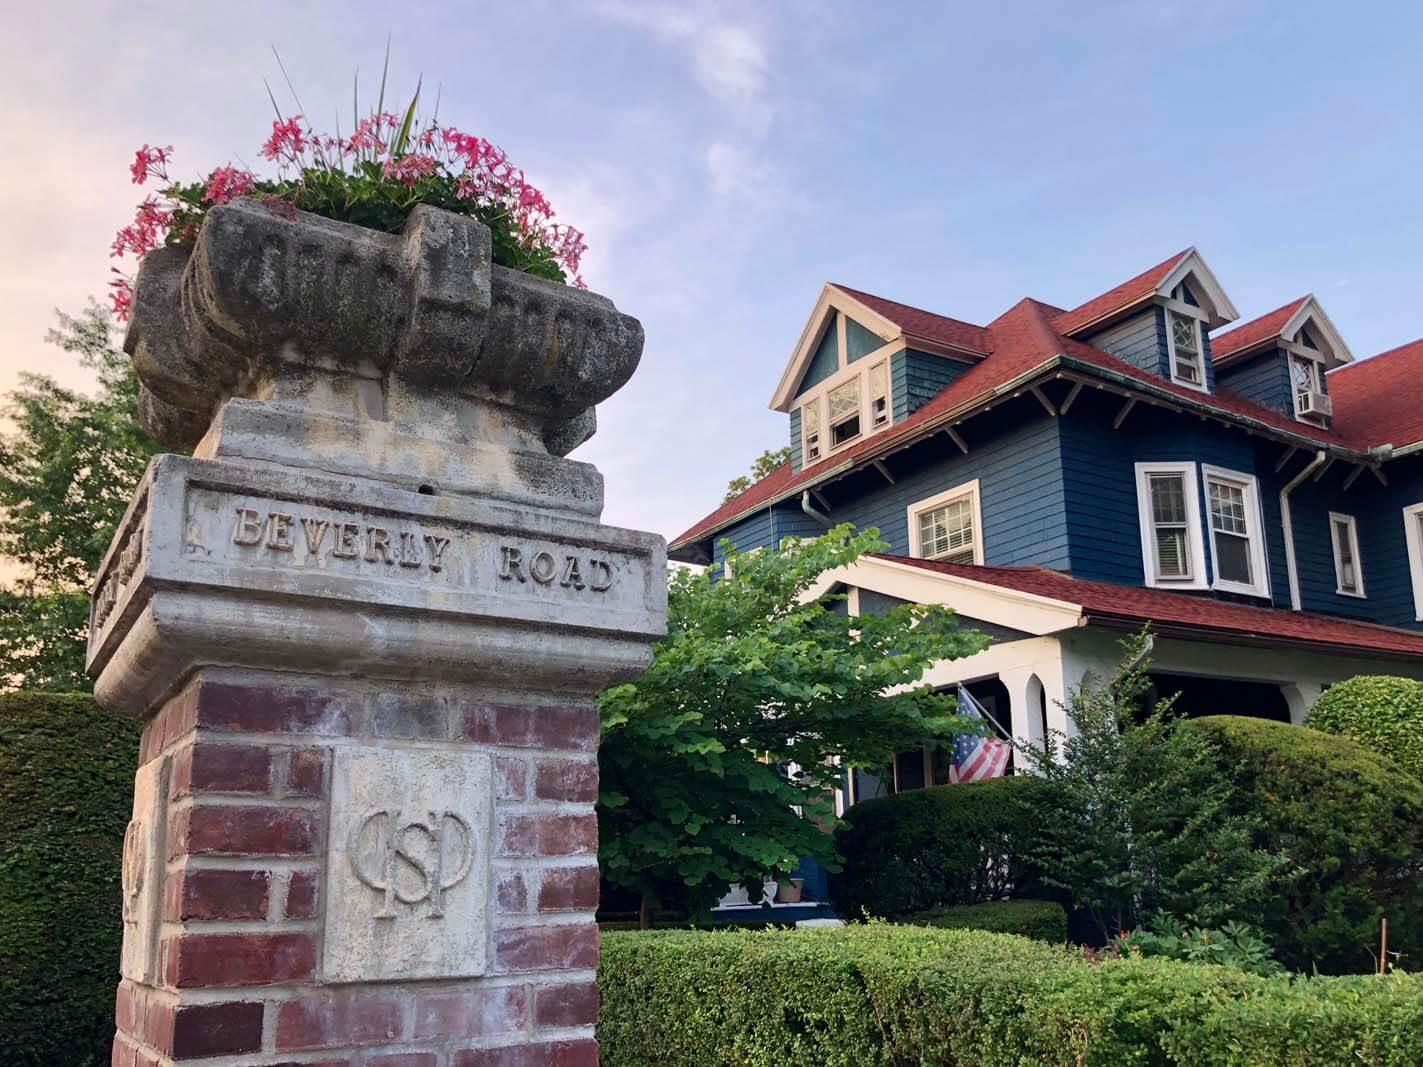 Historic Landmark Beverly Road in Ditmas Park and Victorian Flatbush Brooklyn